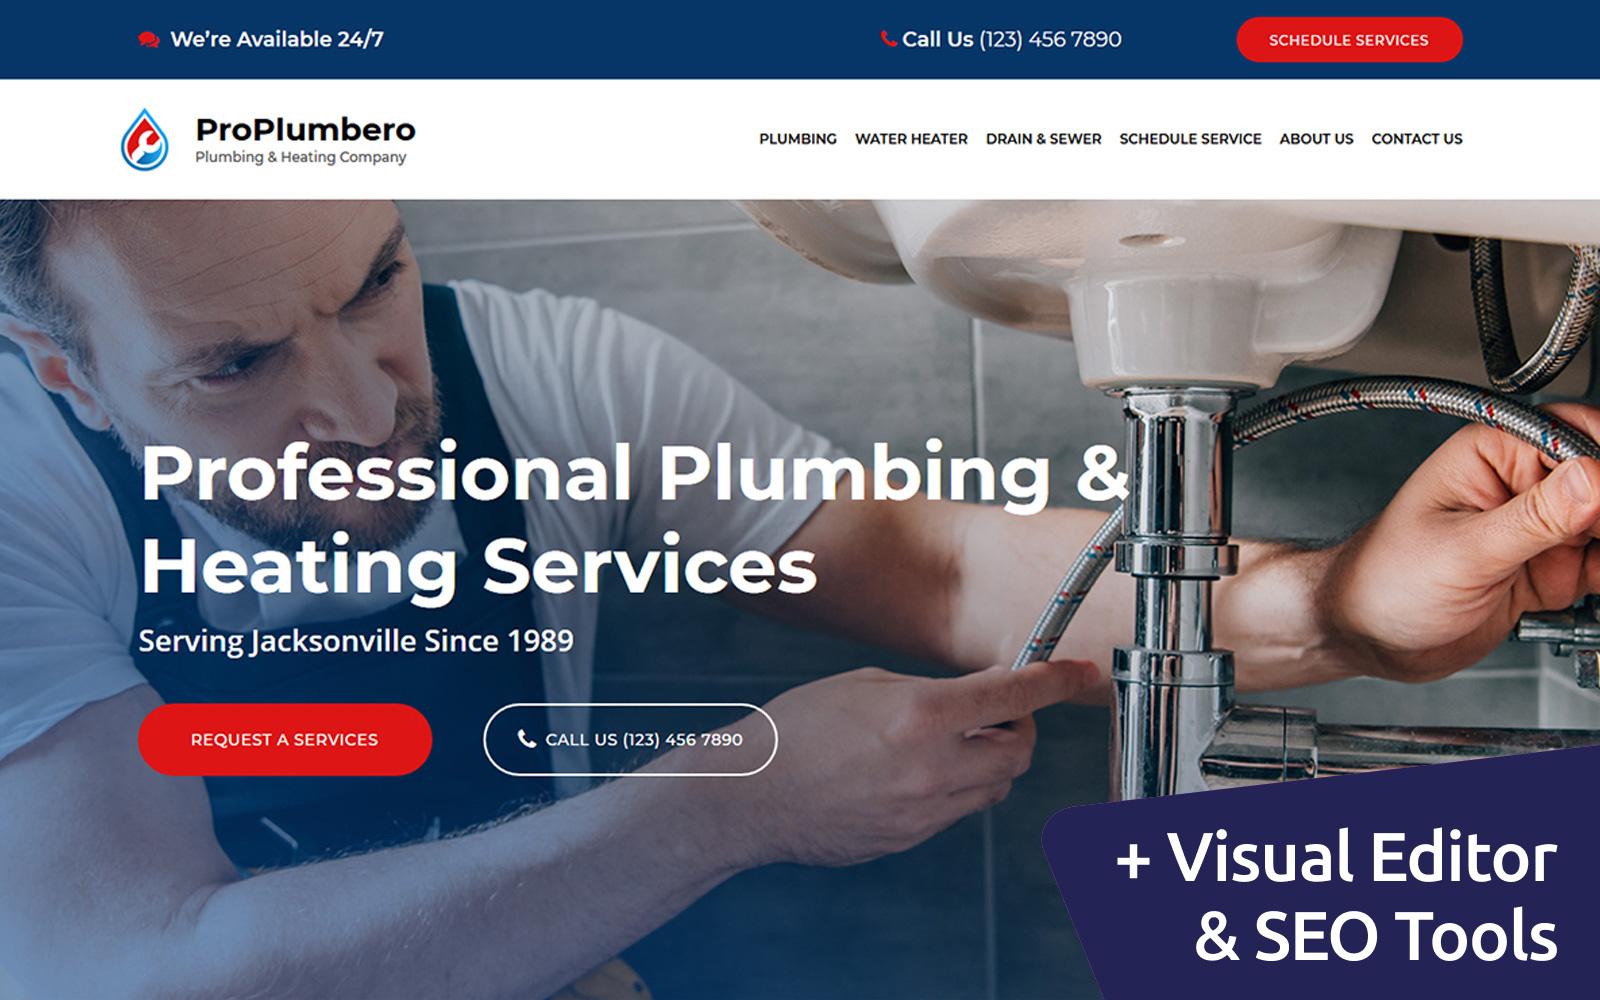 ProPlumbero - Plumbing & Heating Company Moto CMS 3 Template